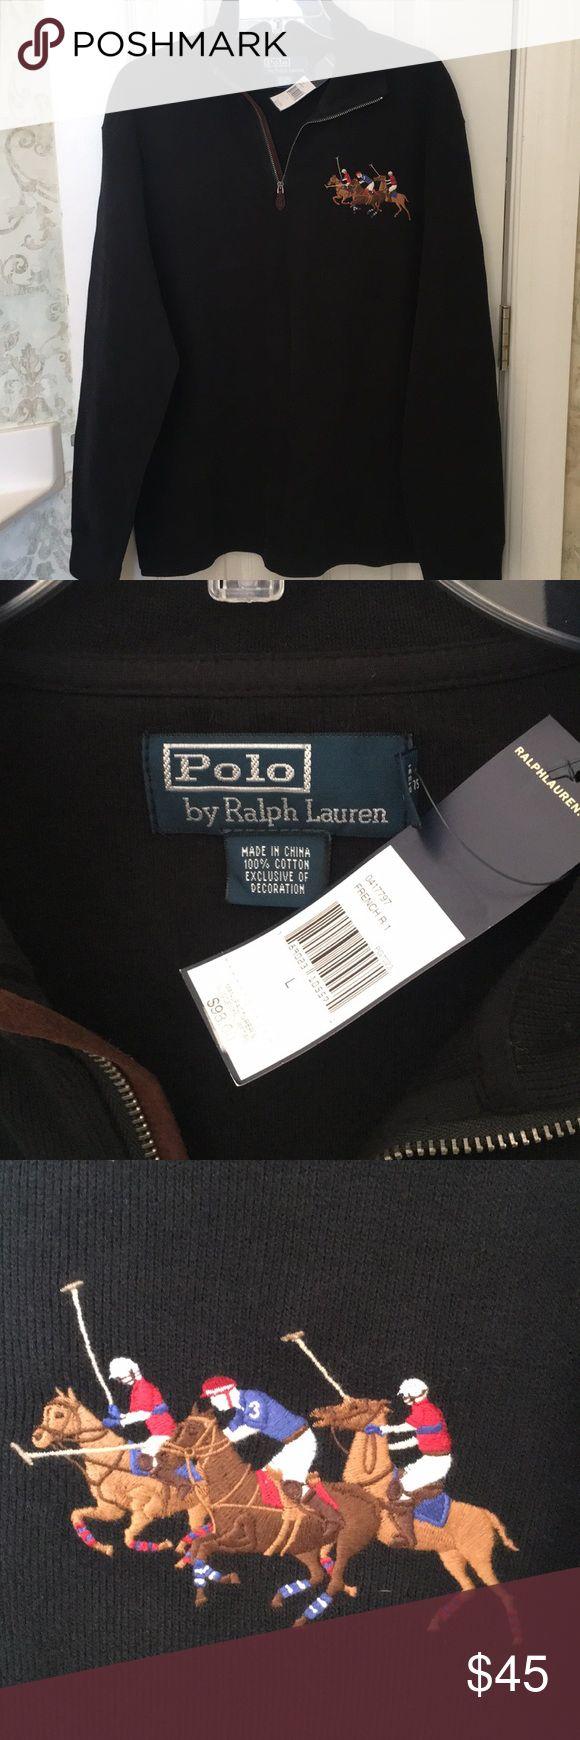 NWT Polo Ralph Lauren Black Hale Zip Knit Pullover NWT Polo Ralph Lauren Black Hale Zip Knit Pullover/Excellent Condition/Size Large Polo by Ralph Lauren Shirts Polos